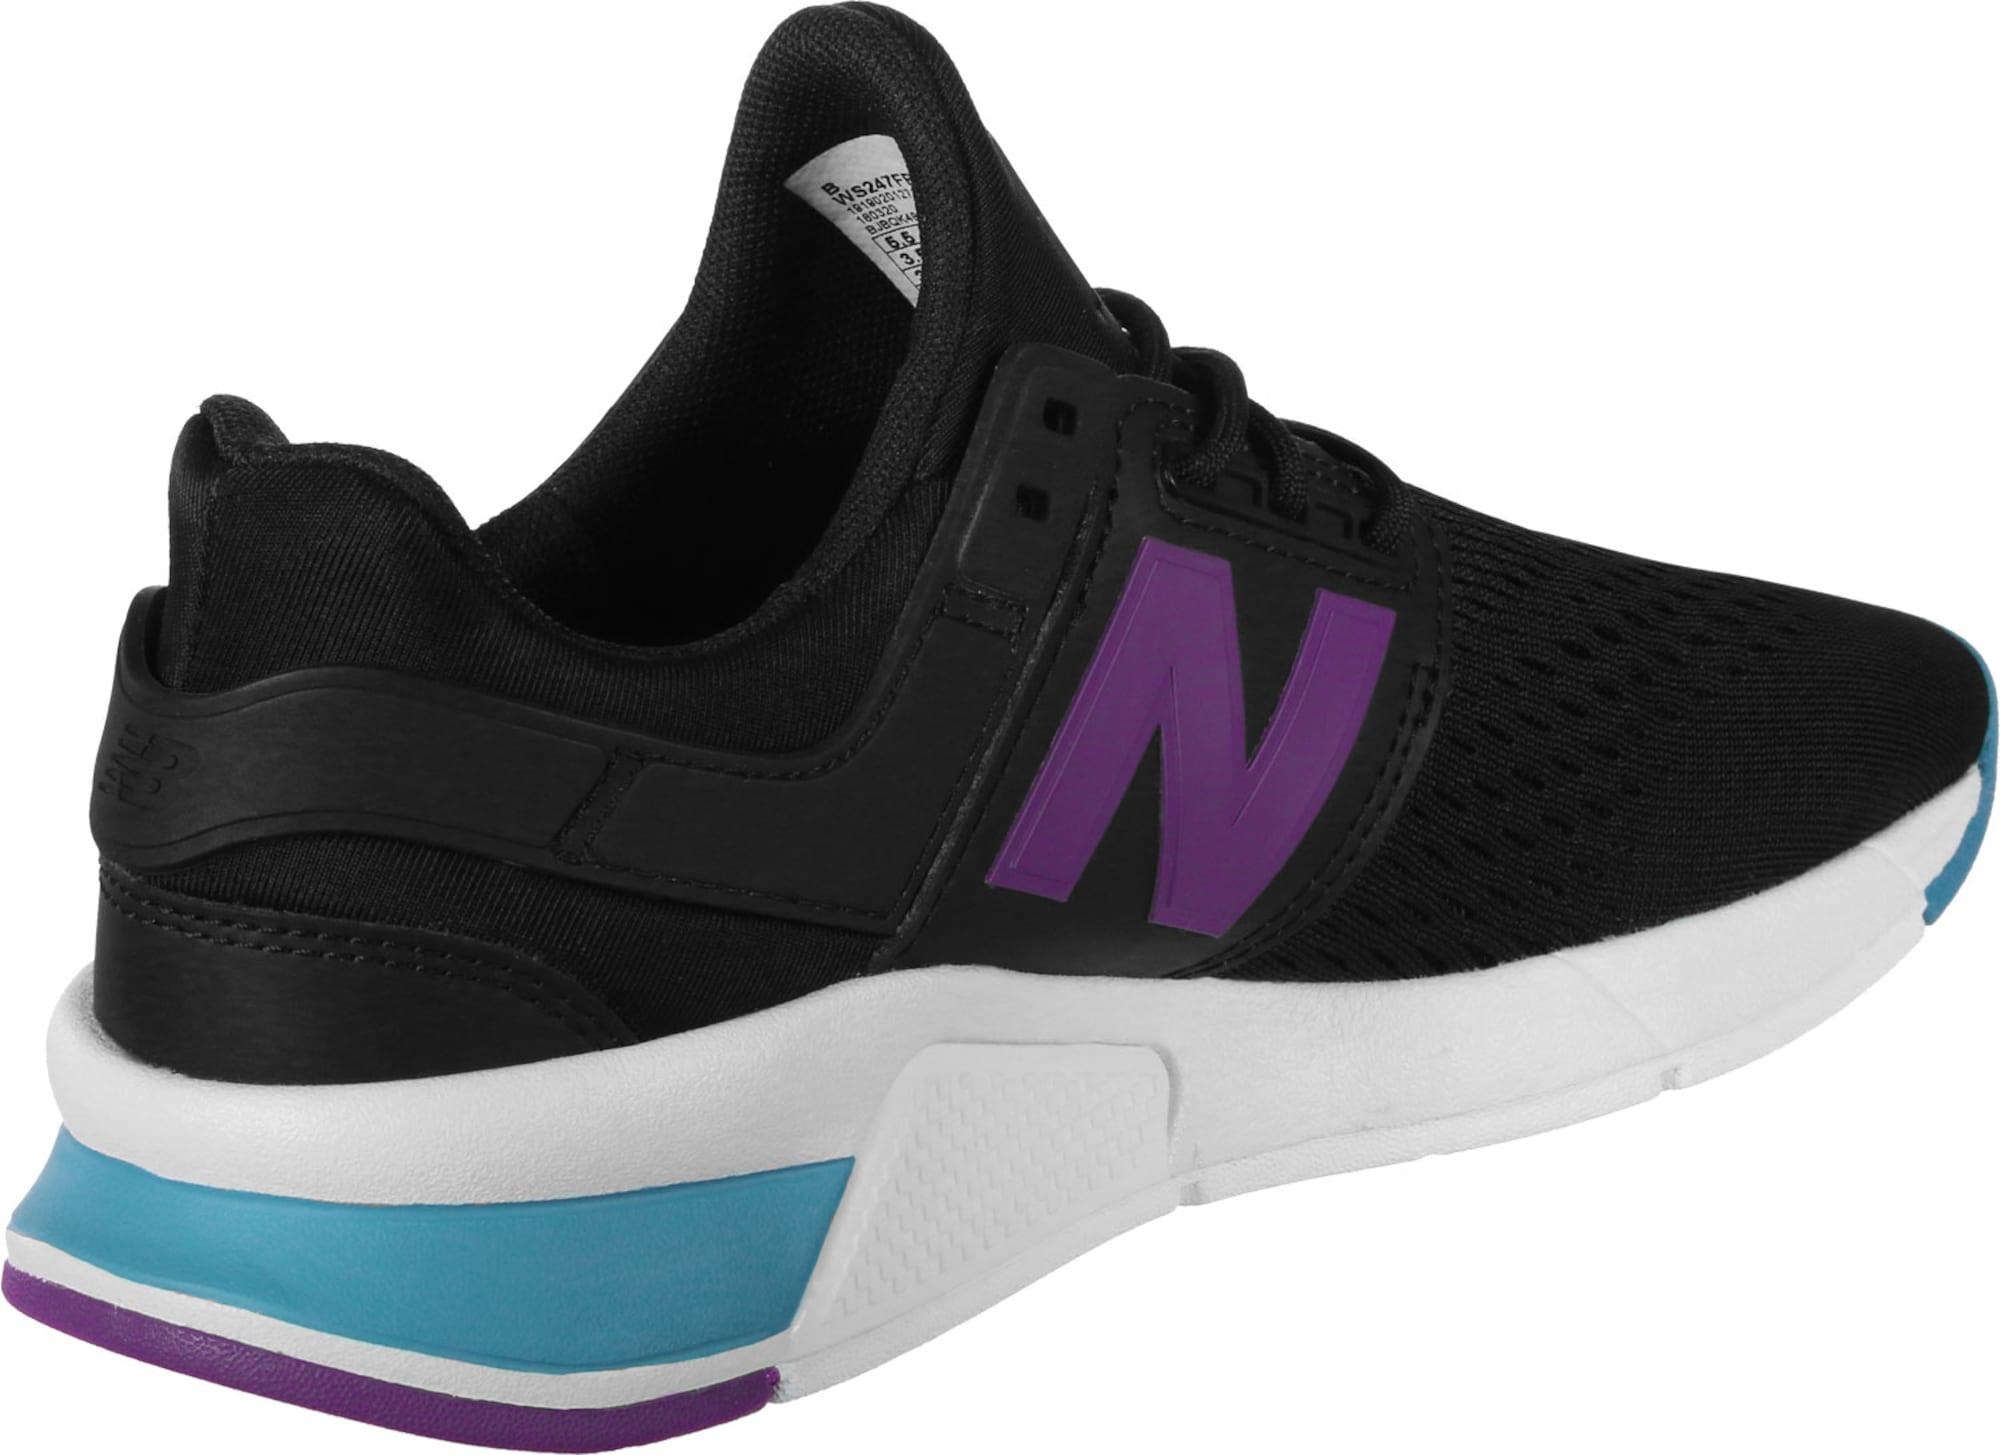 Donkerlila Laag New Sneakers Zwart Wit Ws247Lichtblauw BalanceDames NnwOm0v8